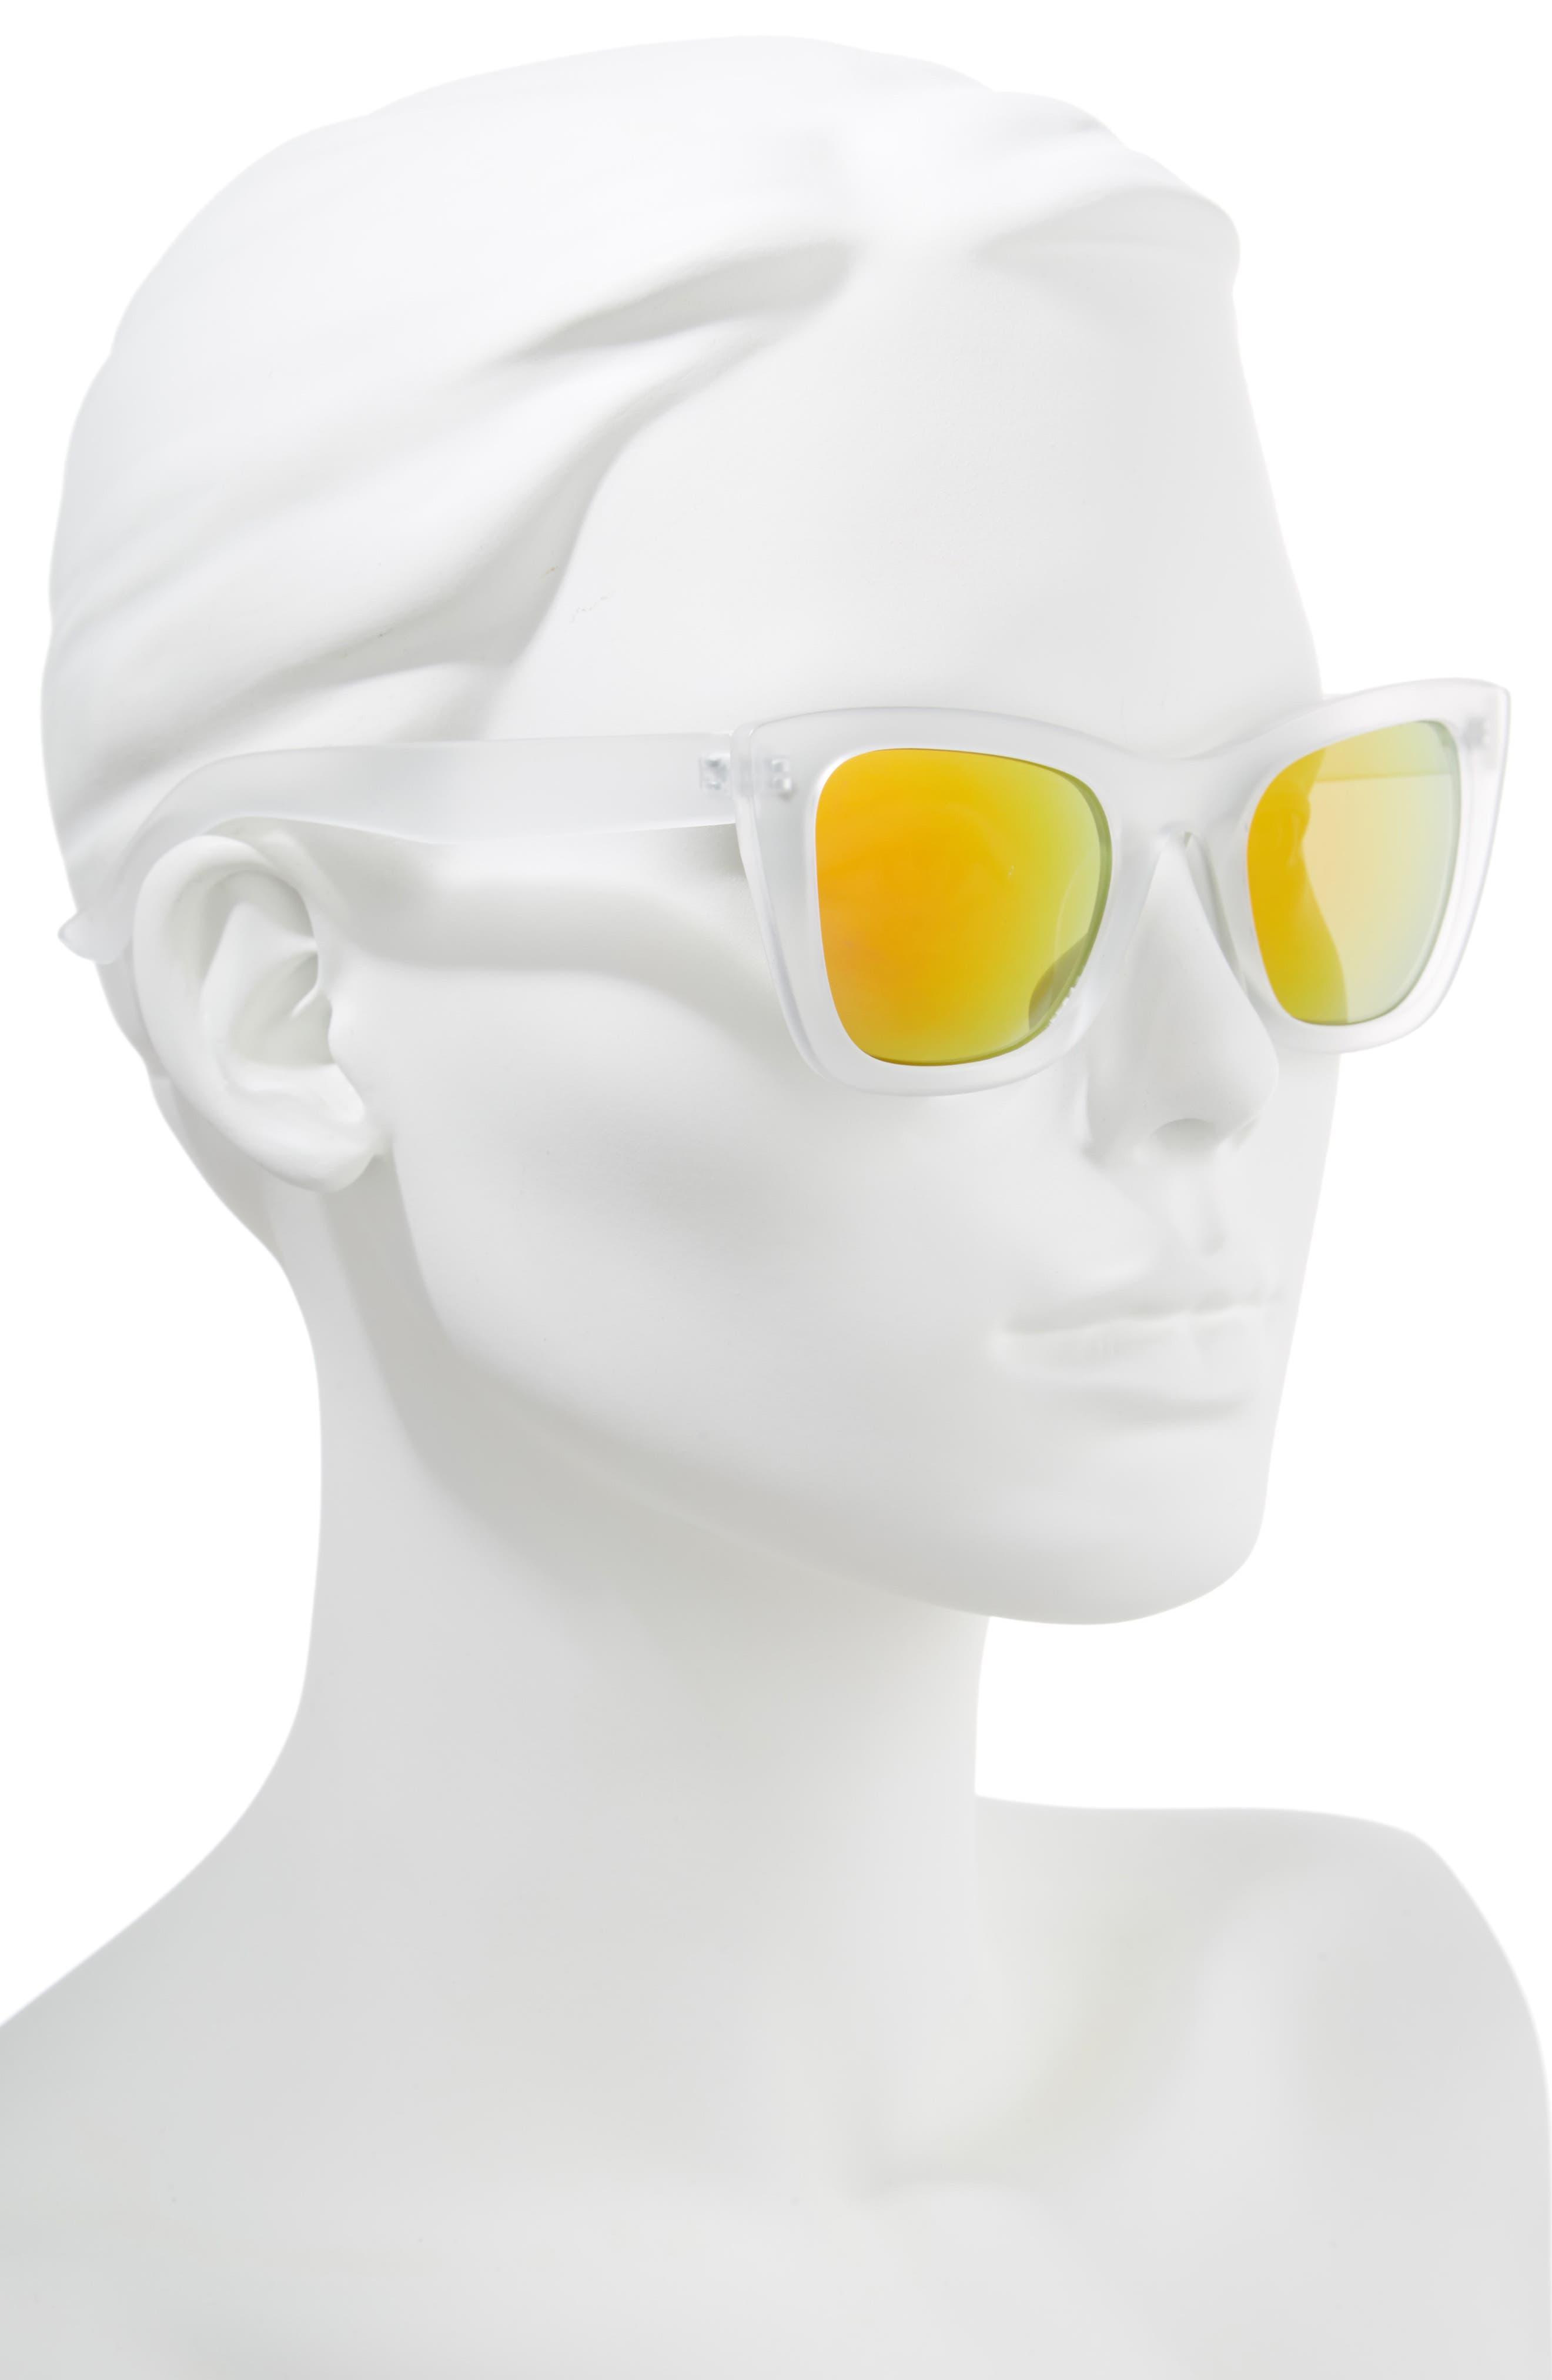 51mm Translucent Square Sunglasses,                             Alternate thumbnail 2, color,                             100